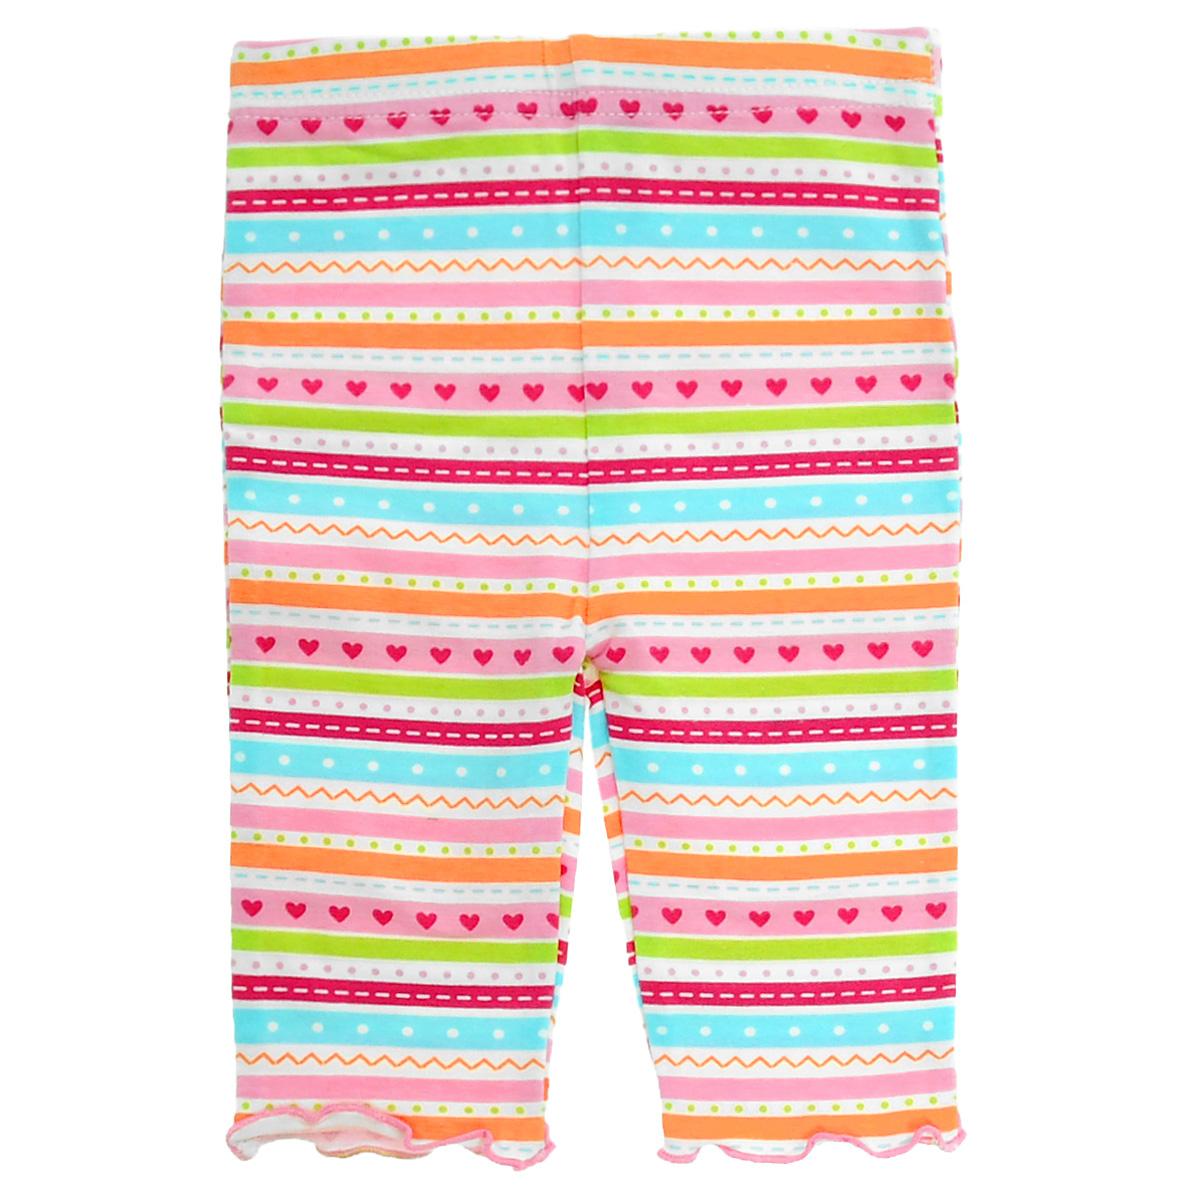 Леггинсы для девочки Luvable Friends Горошек, цвет: розовый, мультицвет. 32060. Размер 55/61, 0-3 месяца